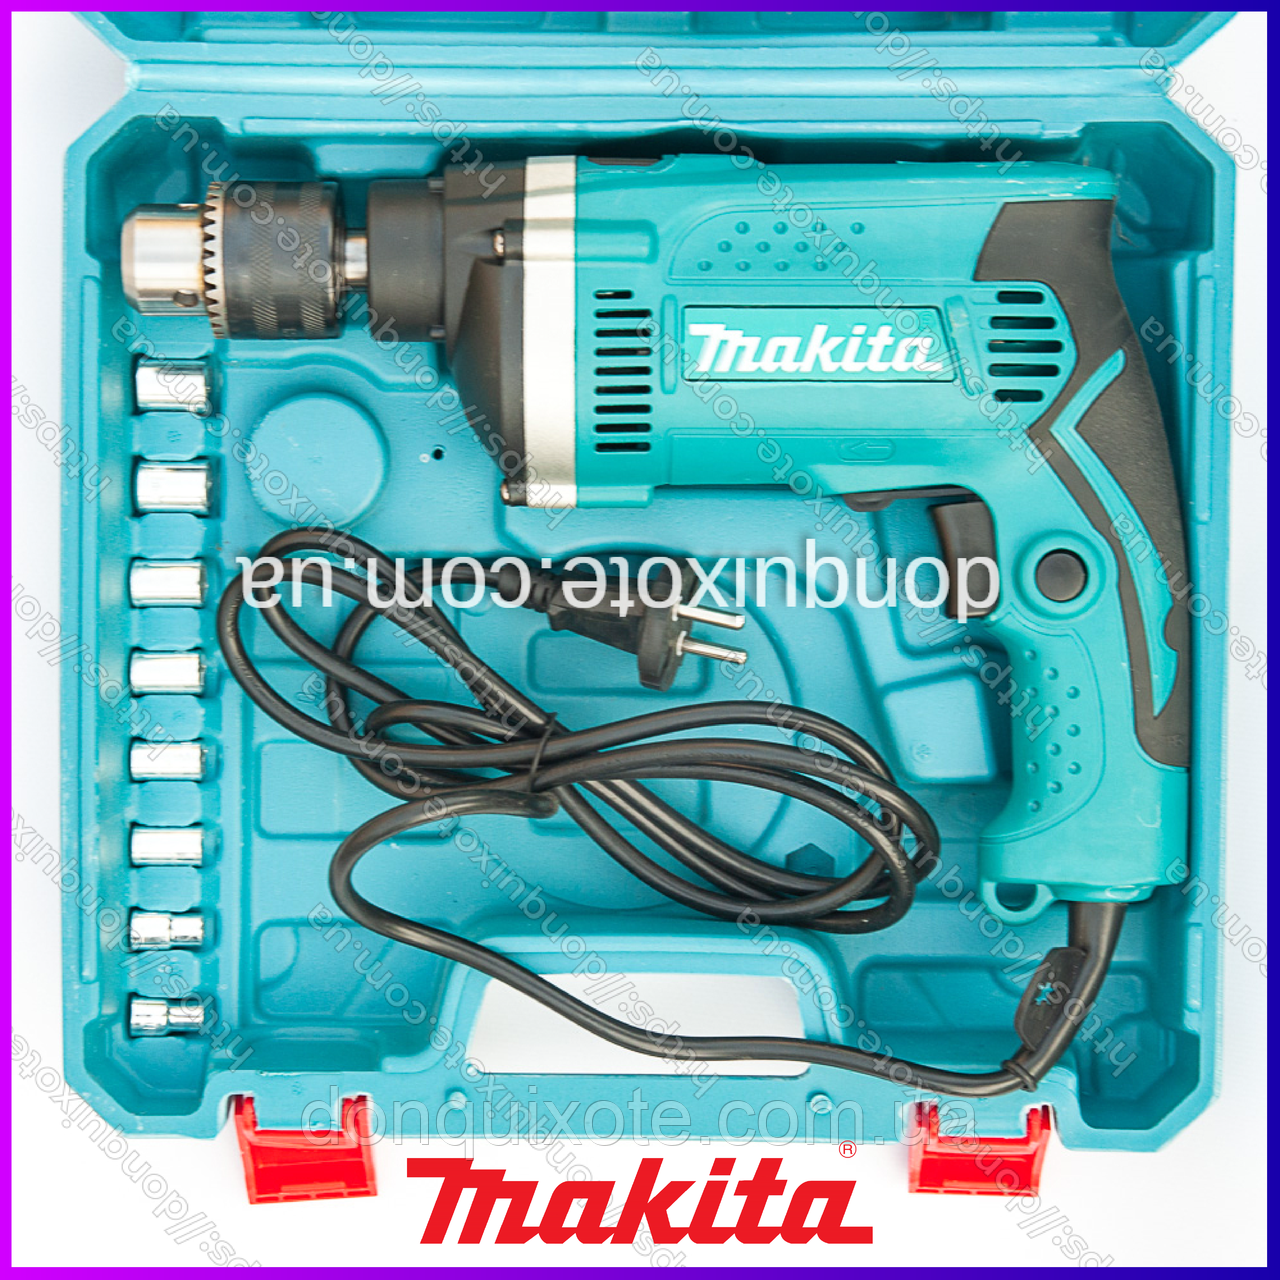 Ударная дрель Makita HP1630 (710 Вт, 0-3200 об./мин.) Дрель Макита